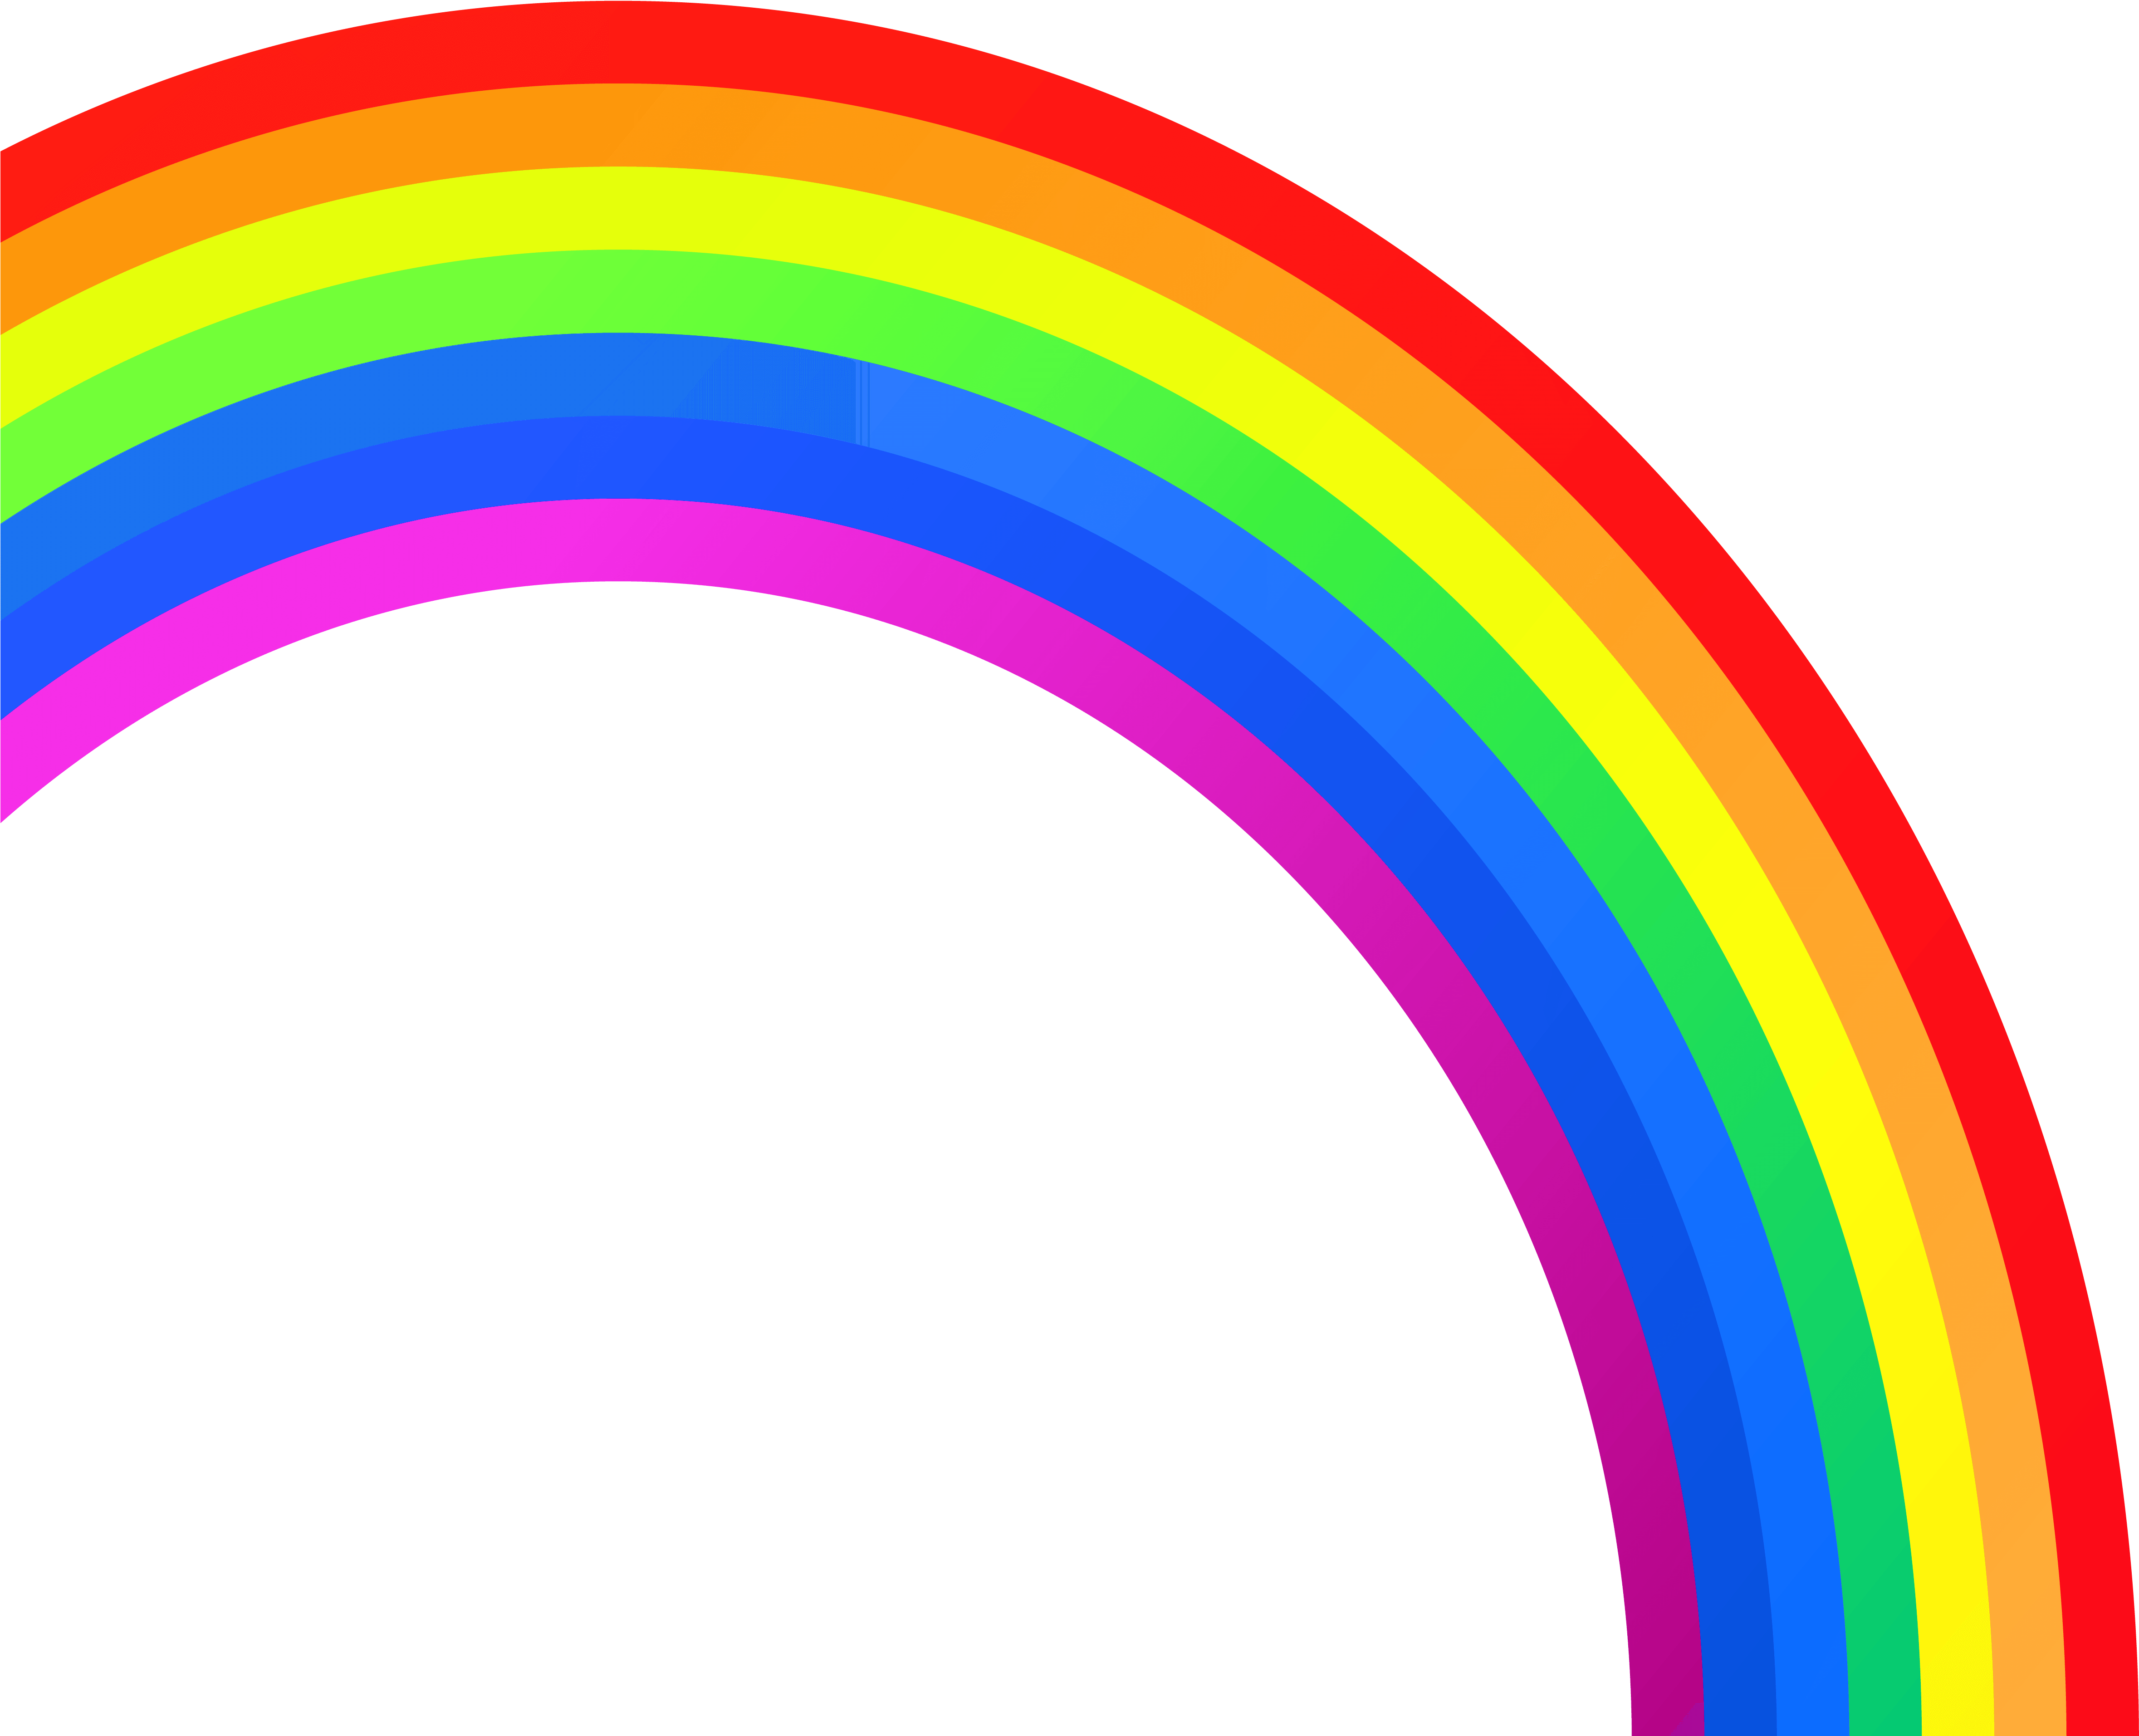 Rainbow Clip Art Free Clipart Image 2 Hanslodge Cliparts.